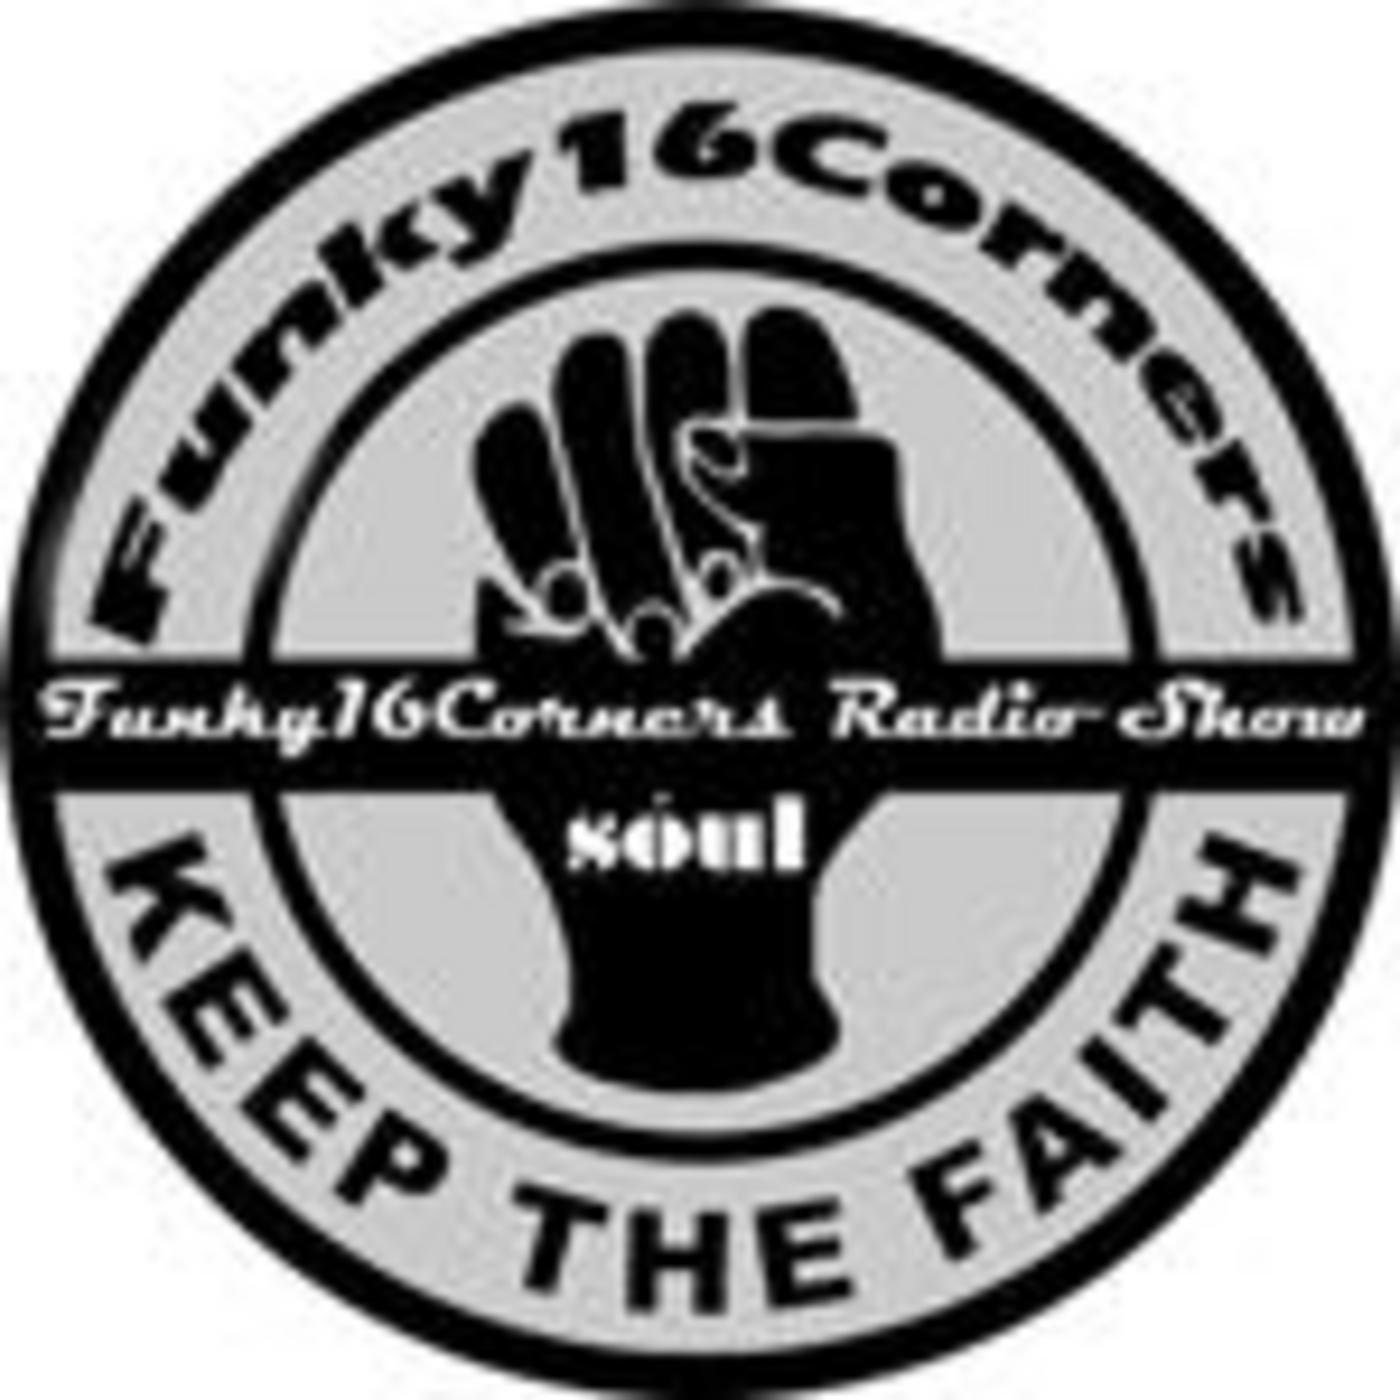 Funky16Corners Radio Show Episode #539 – Airdate 10/19/20